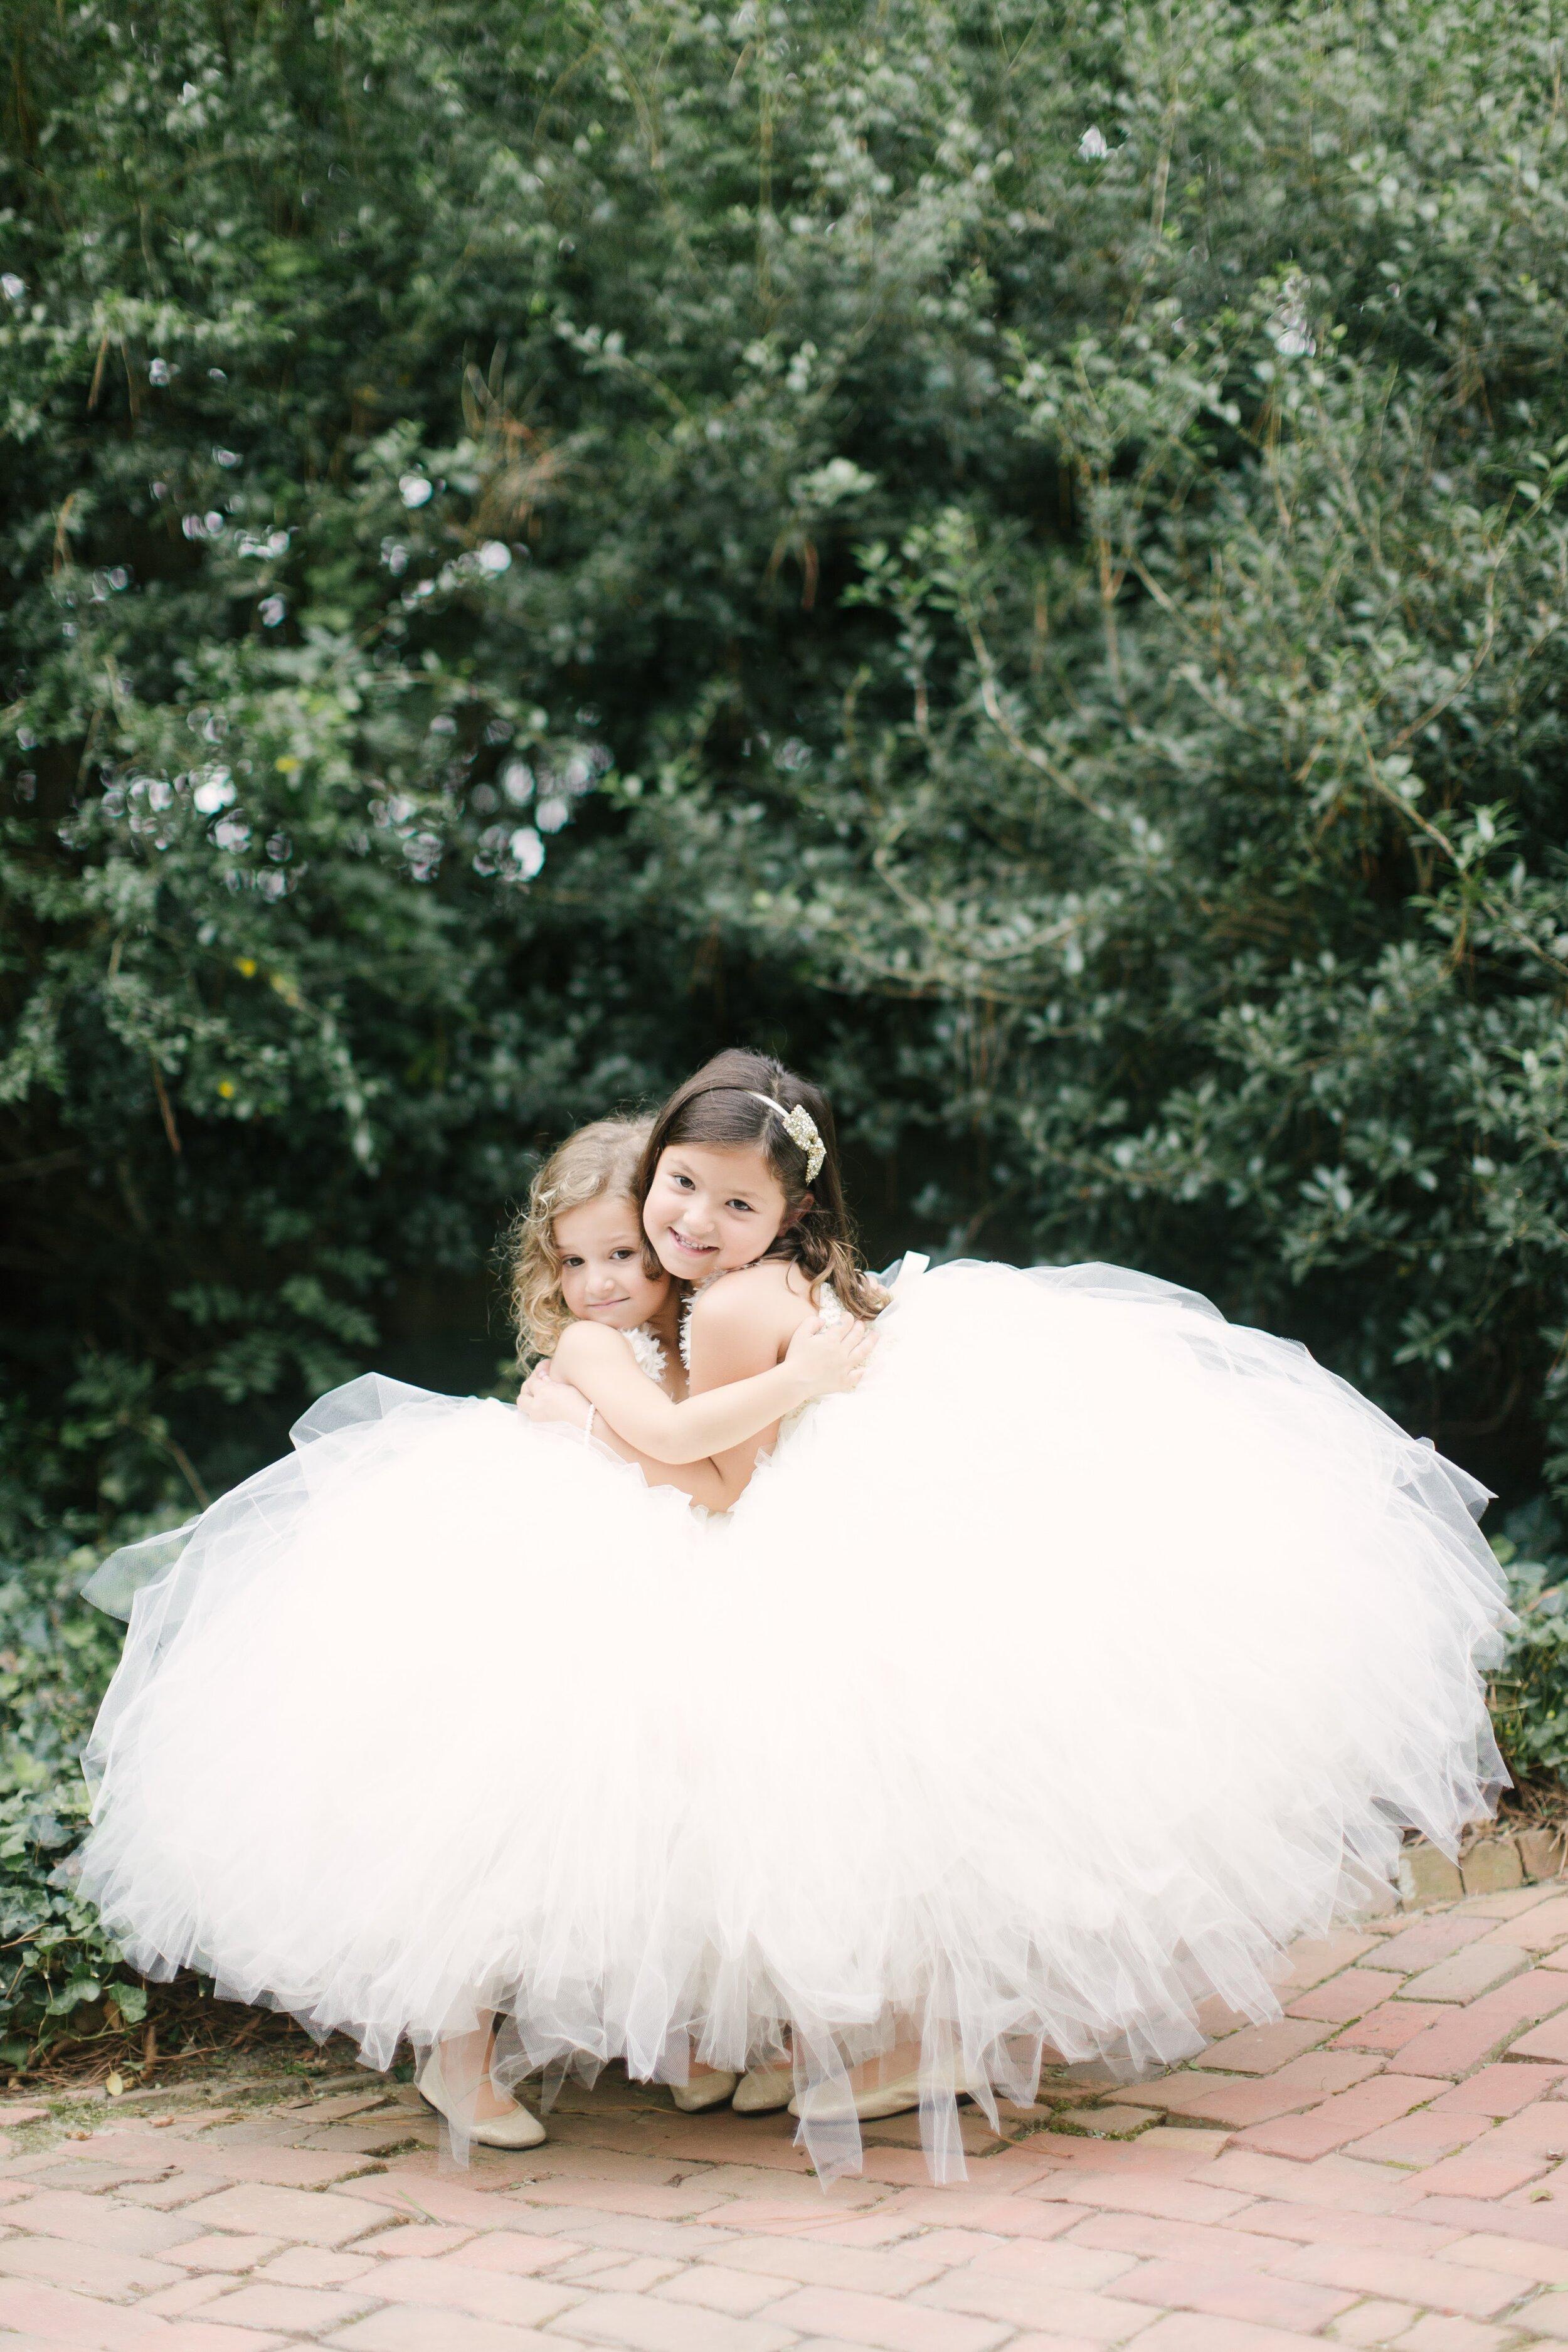 bridalparty-wedding-sarah-street-photography-3.jpg